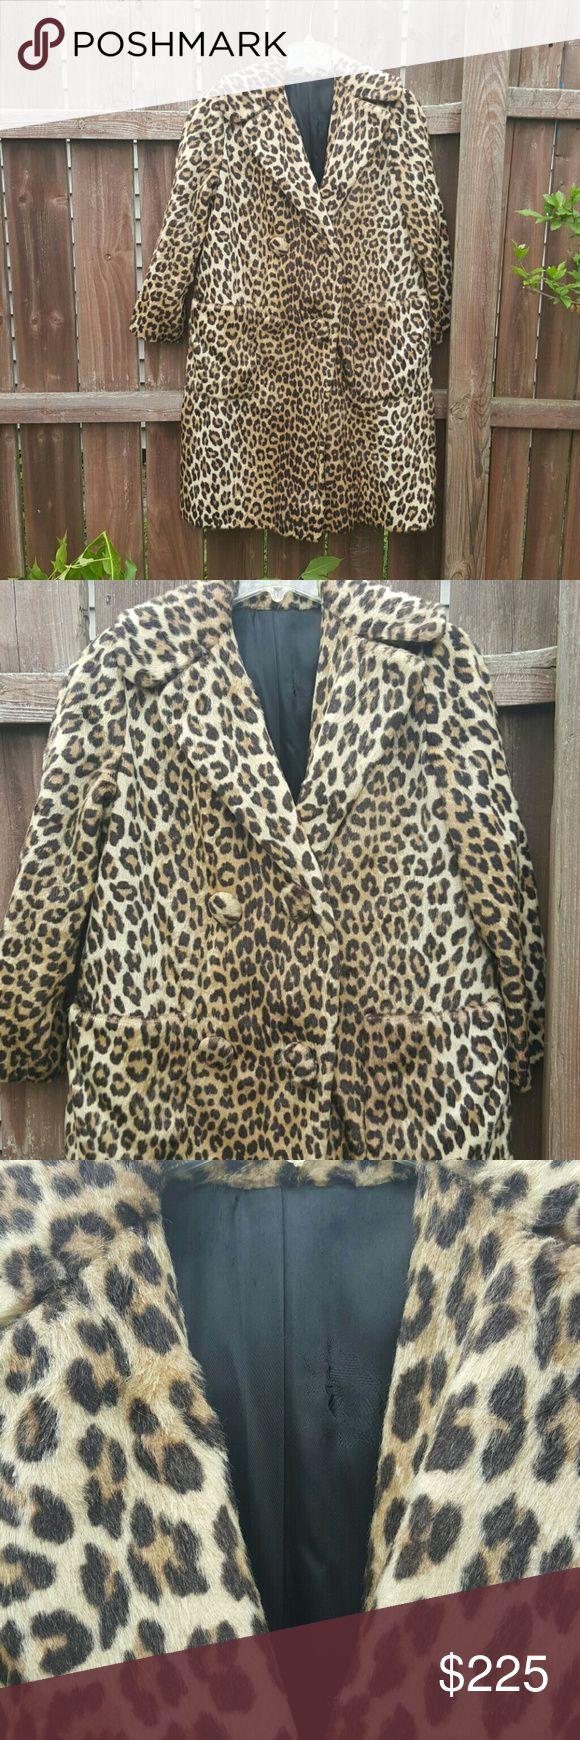 25+ best ideas about Leopard coat on Pinterest   Leopard ...